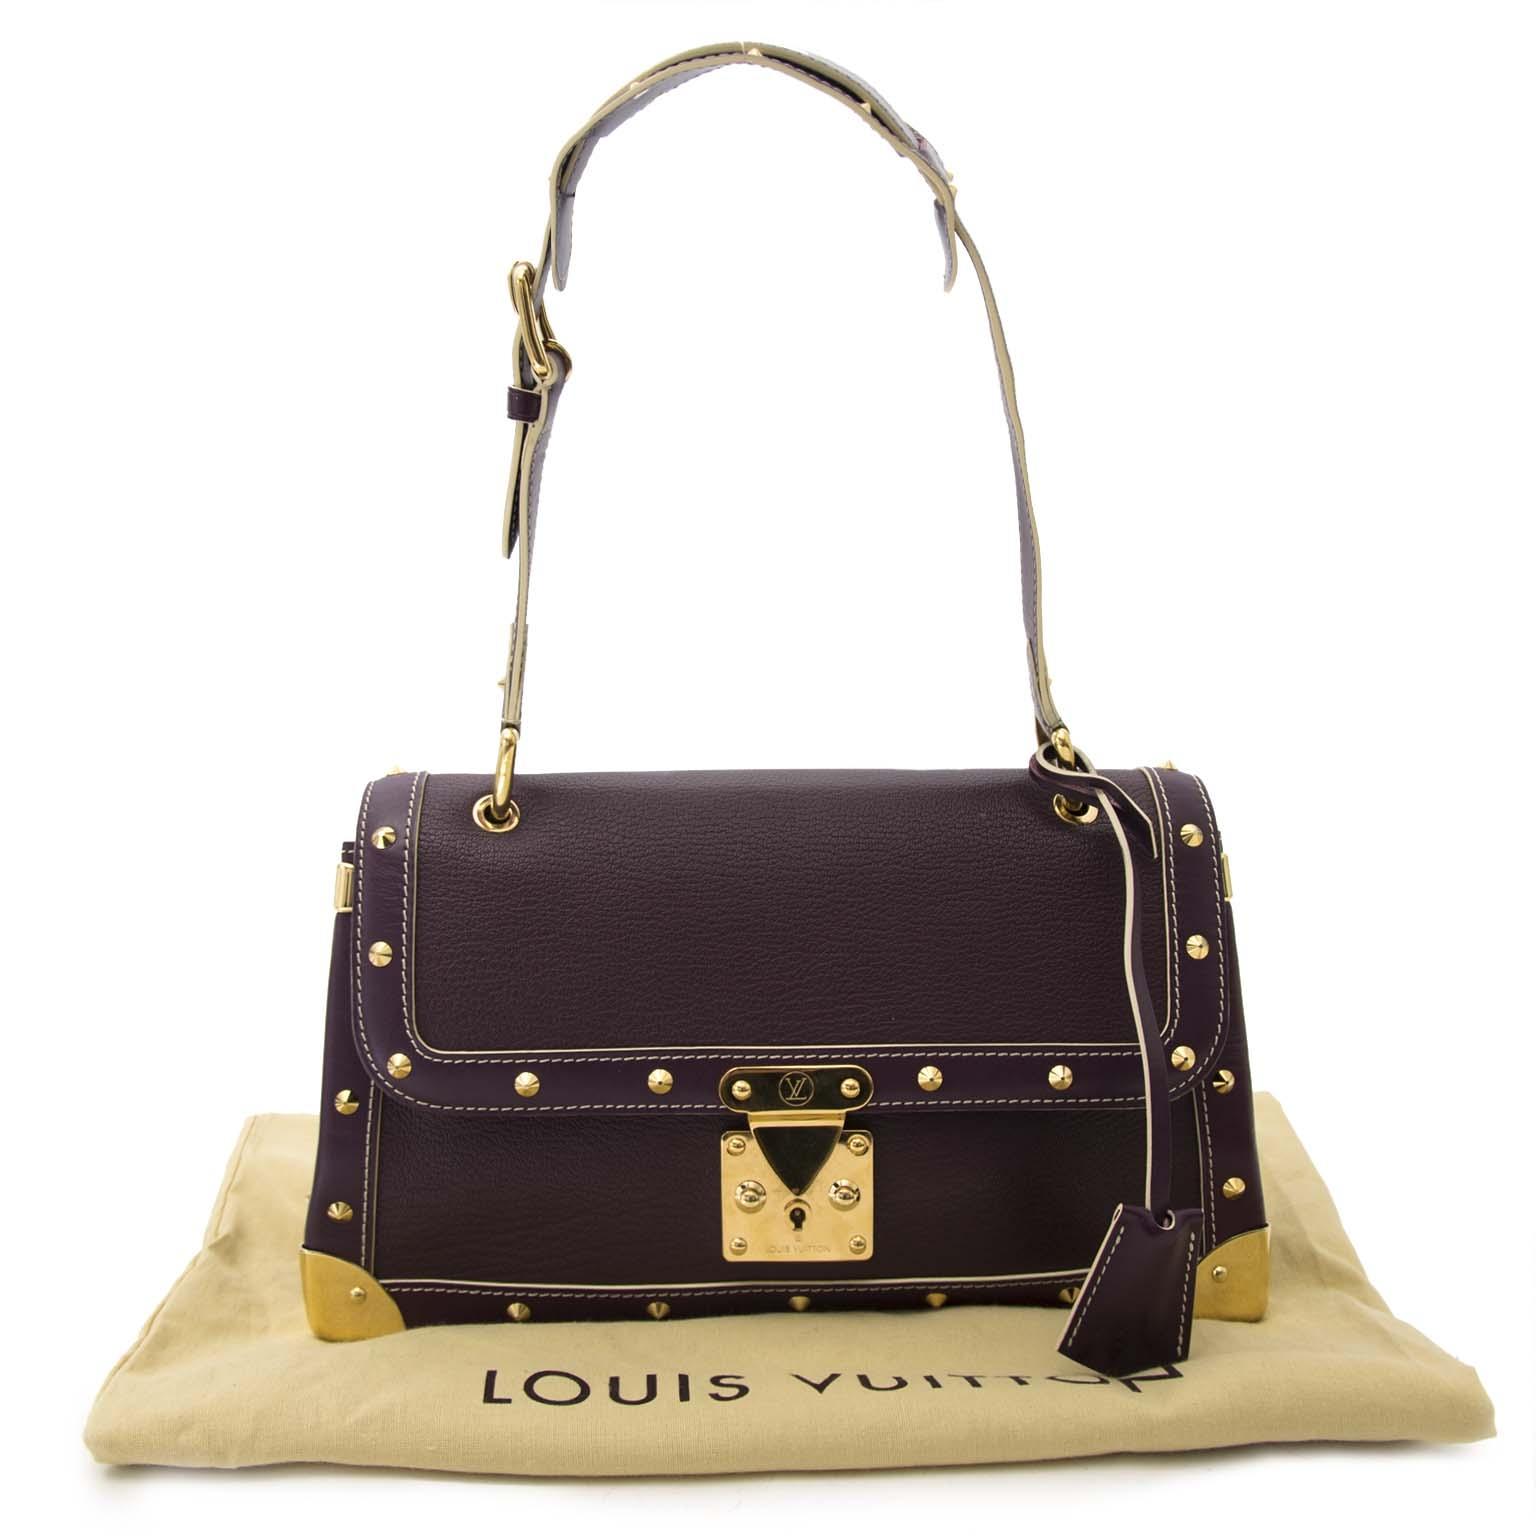 Louis Vuitton Yellow Vernis Mini Bag Buy authentic designer Louis Vuitton secondhand bags at Labellov at the best price. Safe and secure shopping. Koop tweedehands authentieke Louis Vuitton tassen bij designer webwinkel labellov.